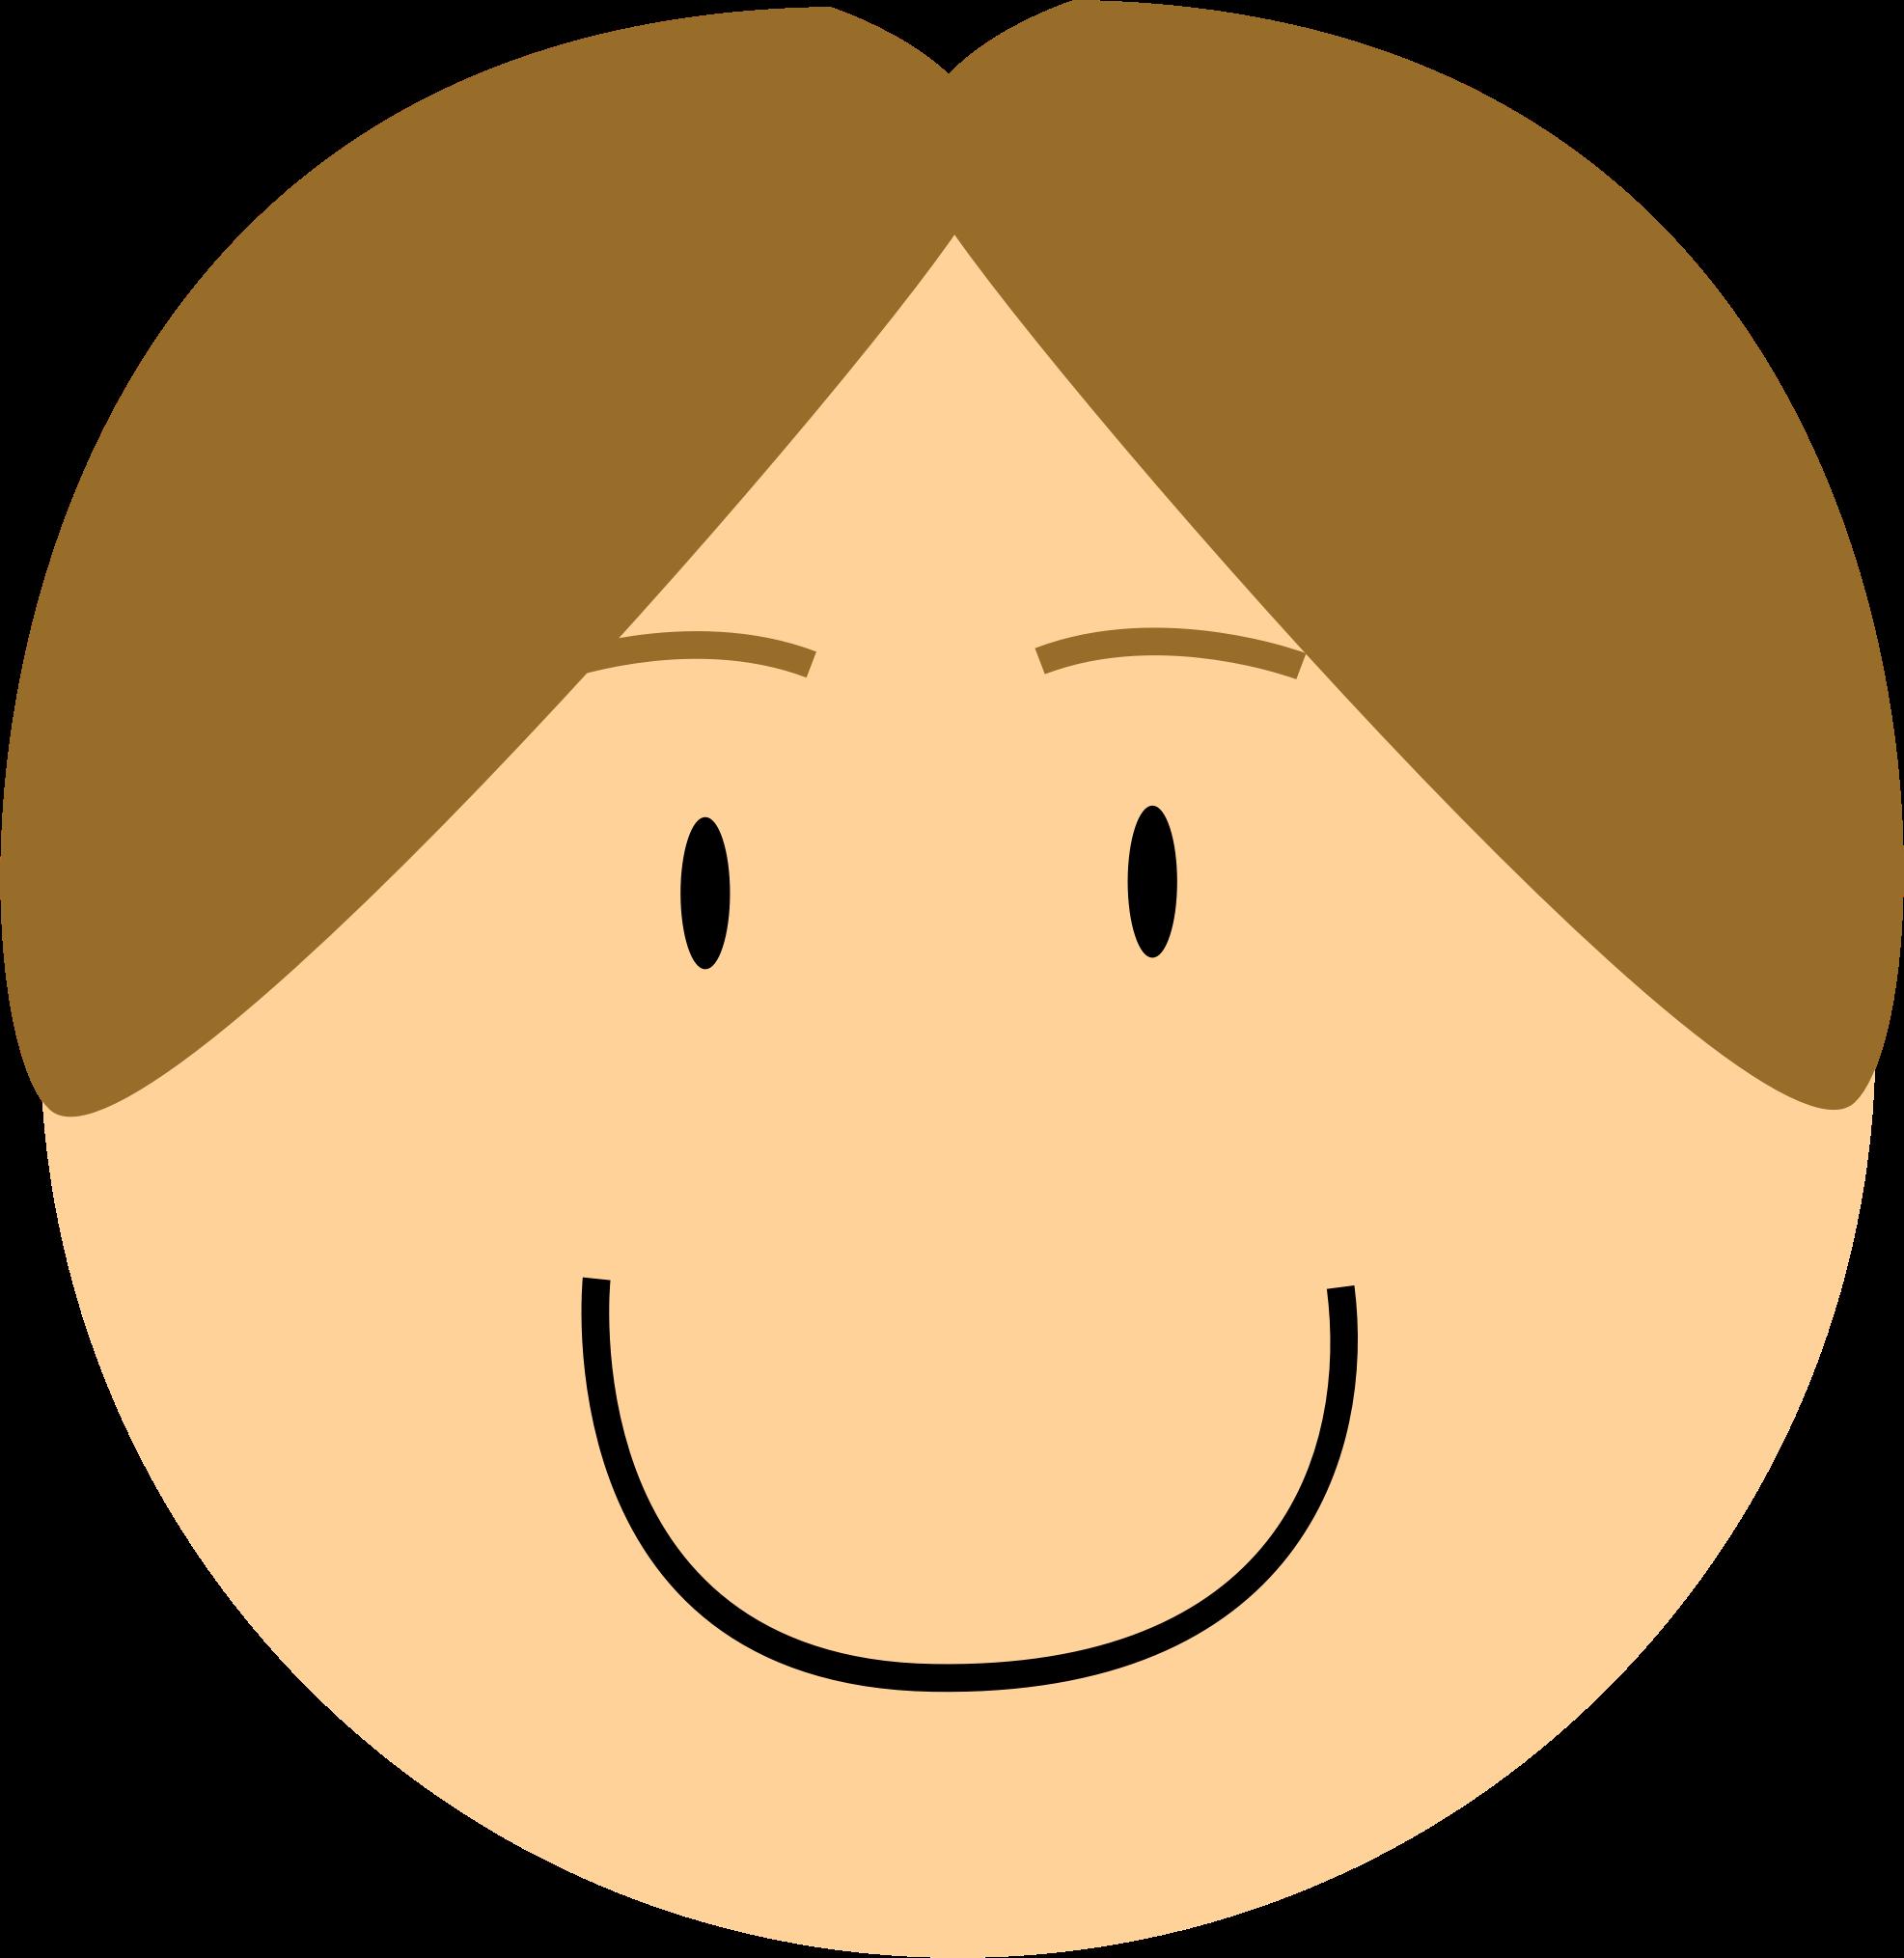 Clipart boy nose. Smiling big image png